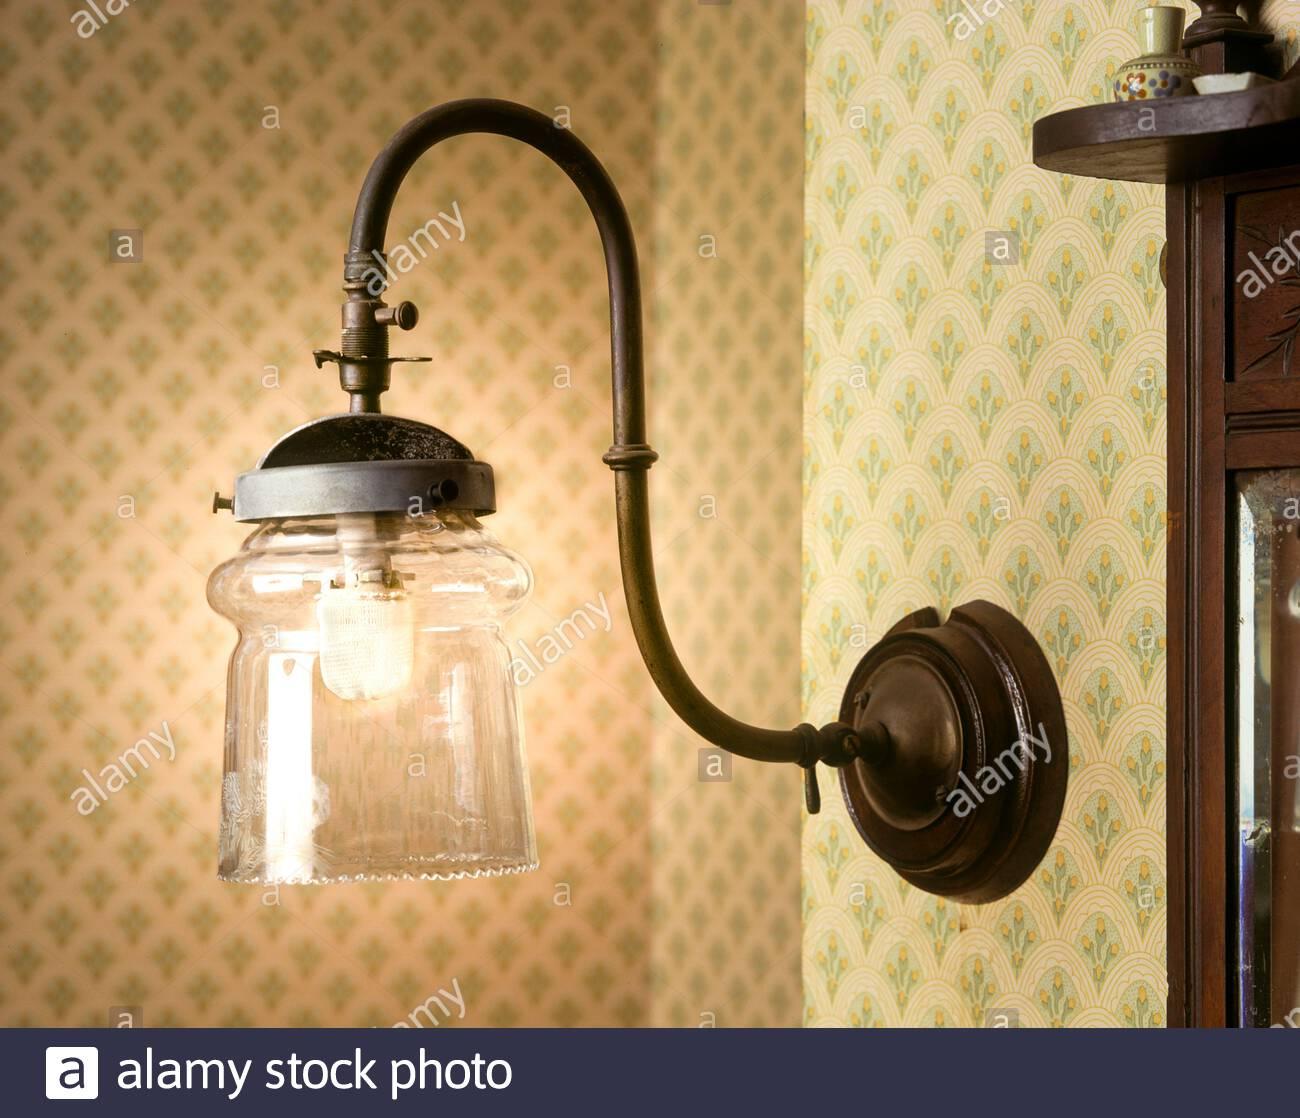 British Rail Replica Outside Wall Light Lamp Sign Light Lantern train